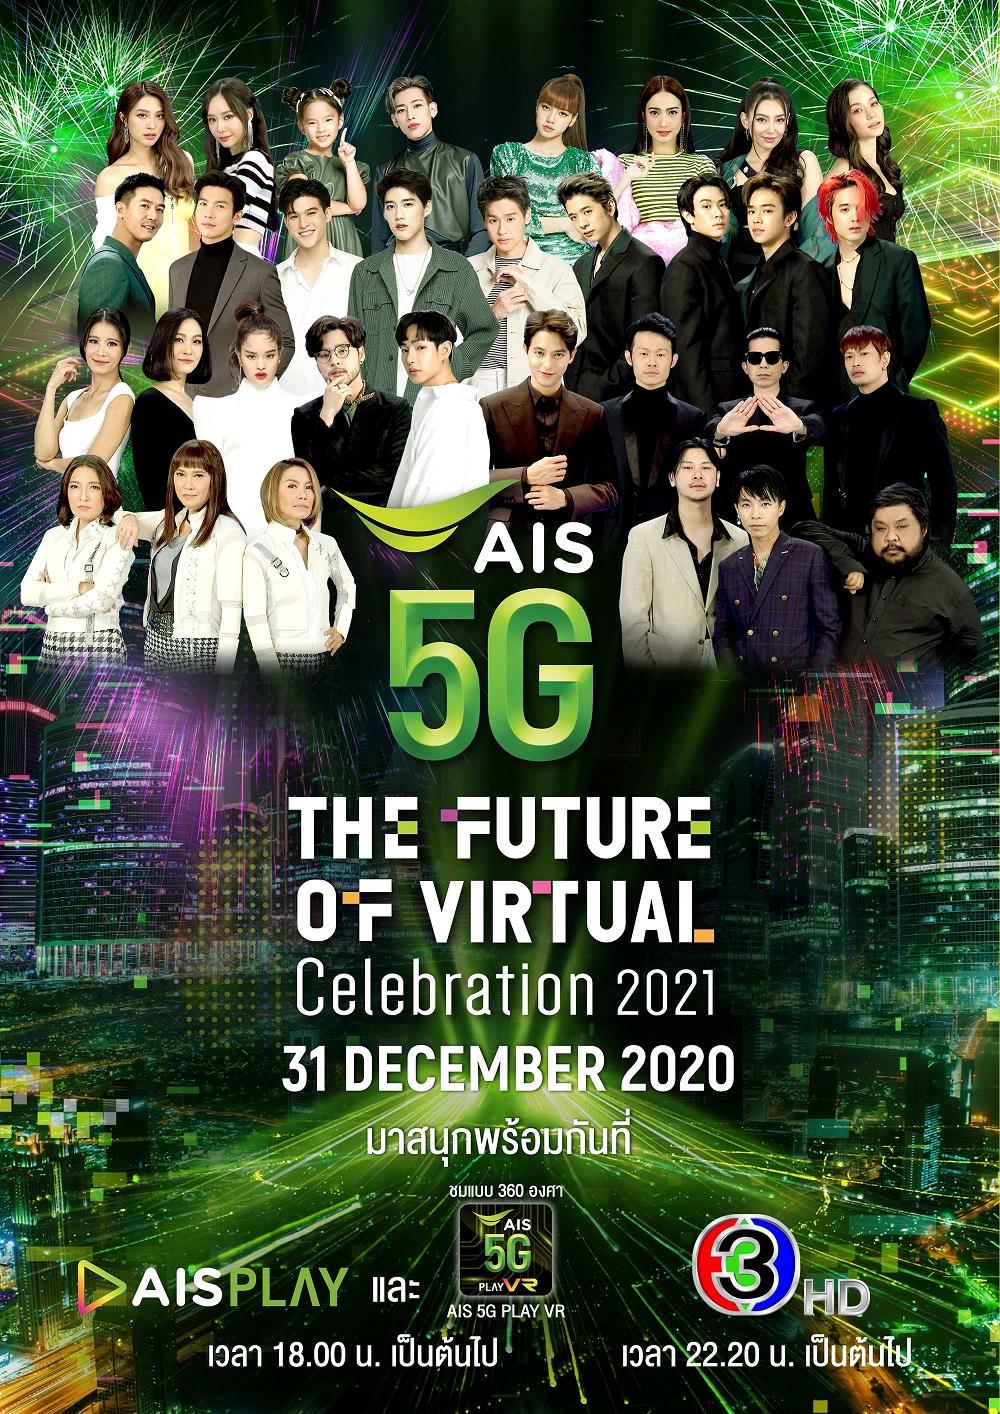 Pic 1 AIS 5G The Future of Viture Celebration 2021